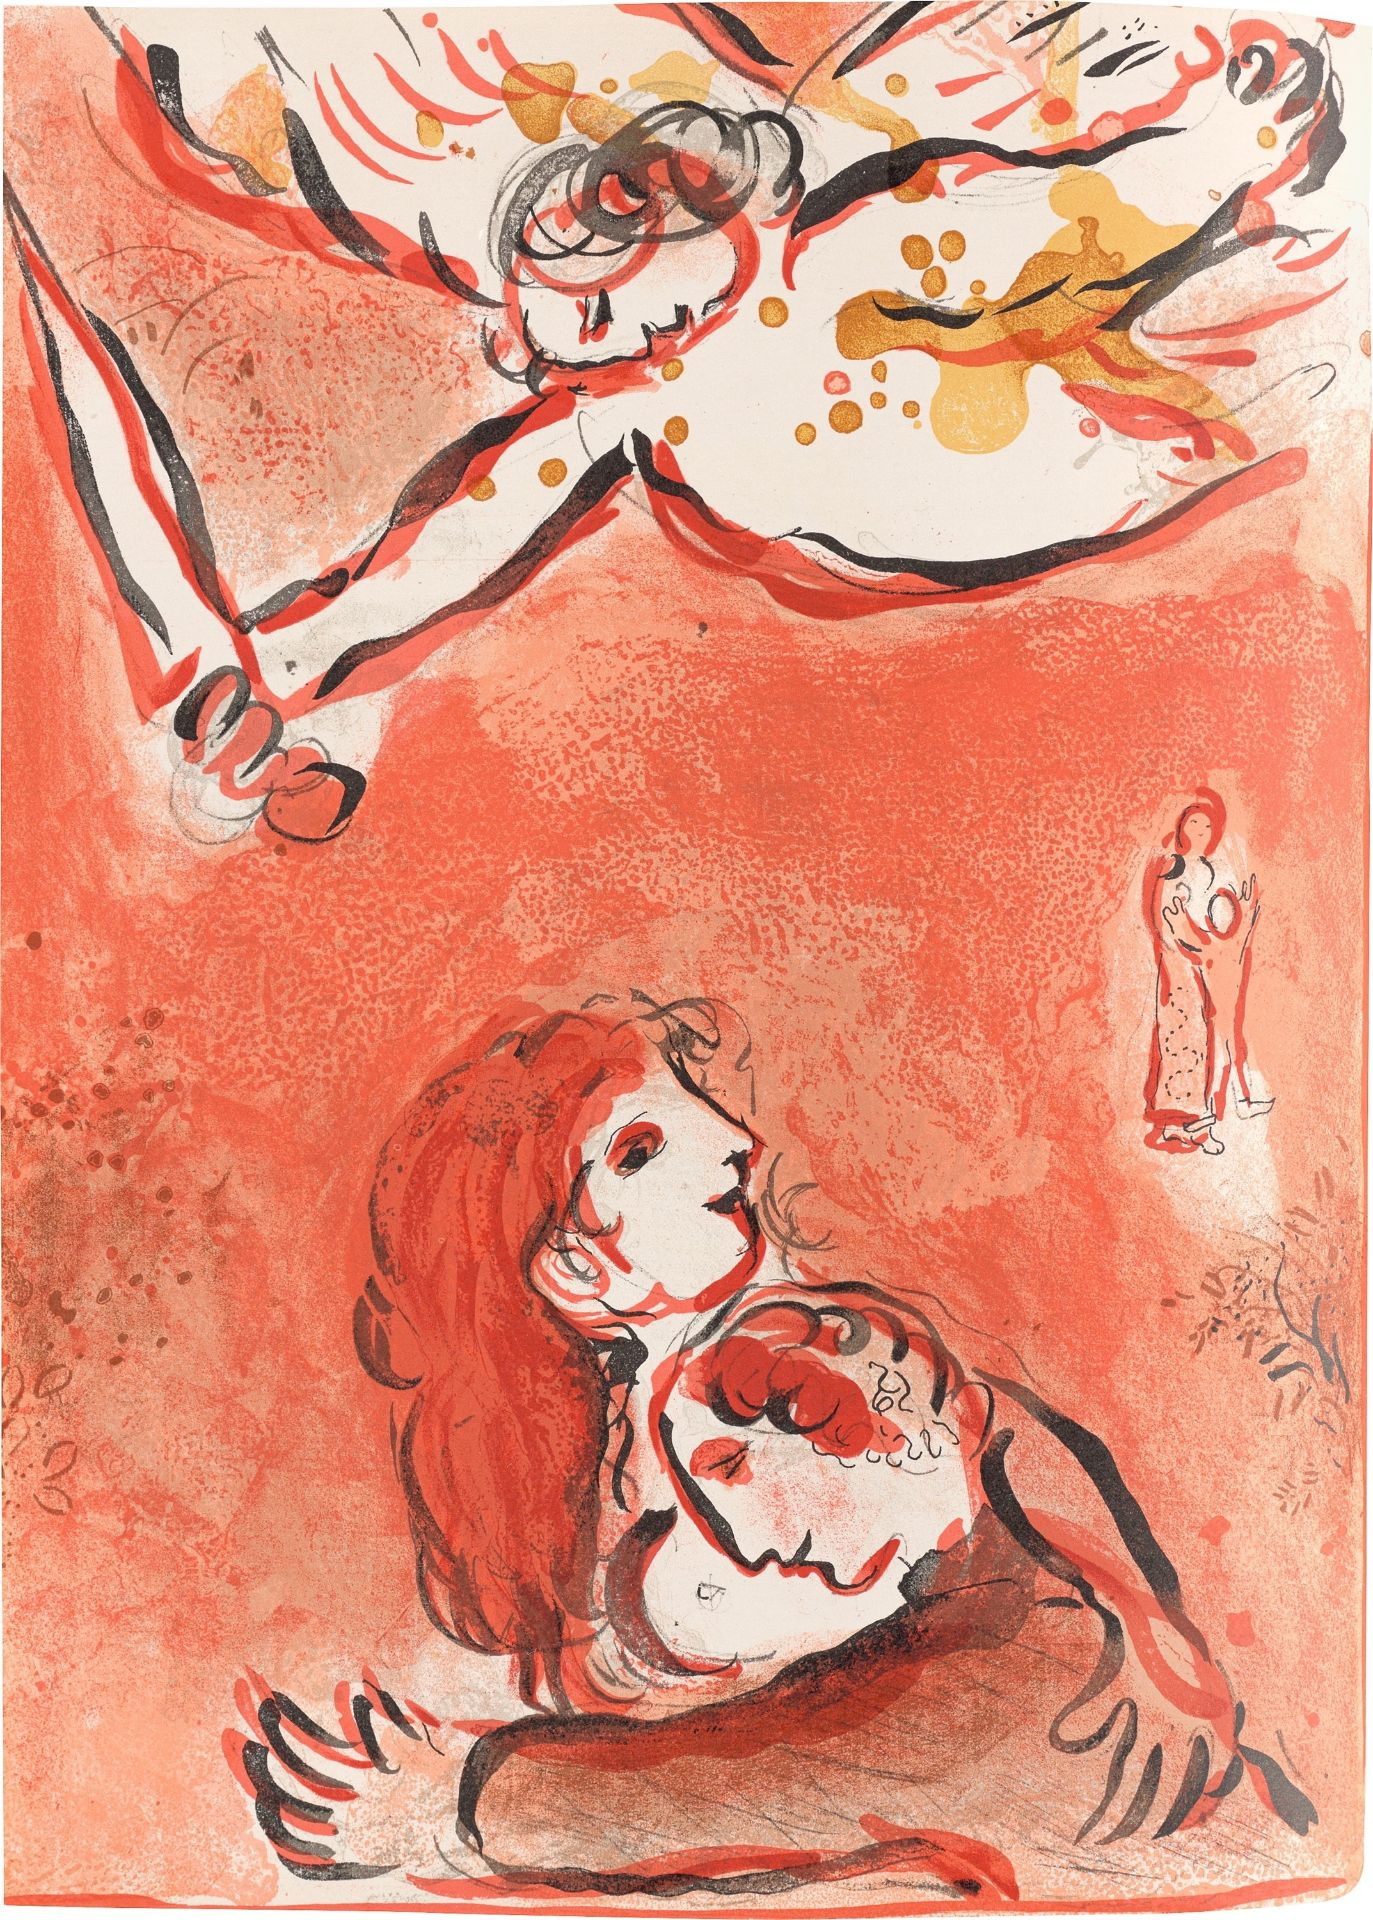 Los 1132 - Marc Chagall (Witebsk 1887 – 1985 Saint-Paul-de-Vence)